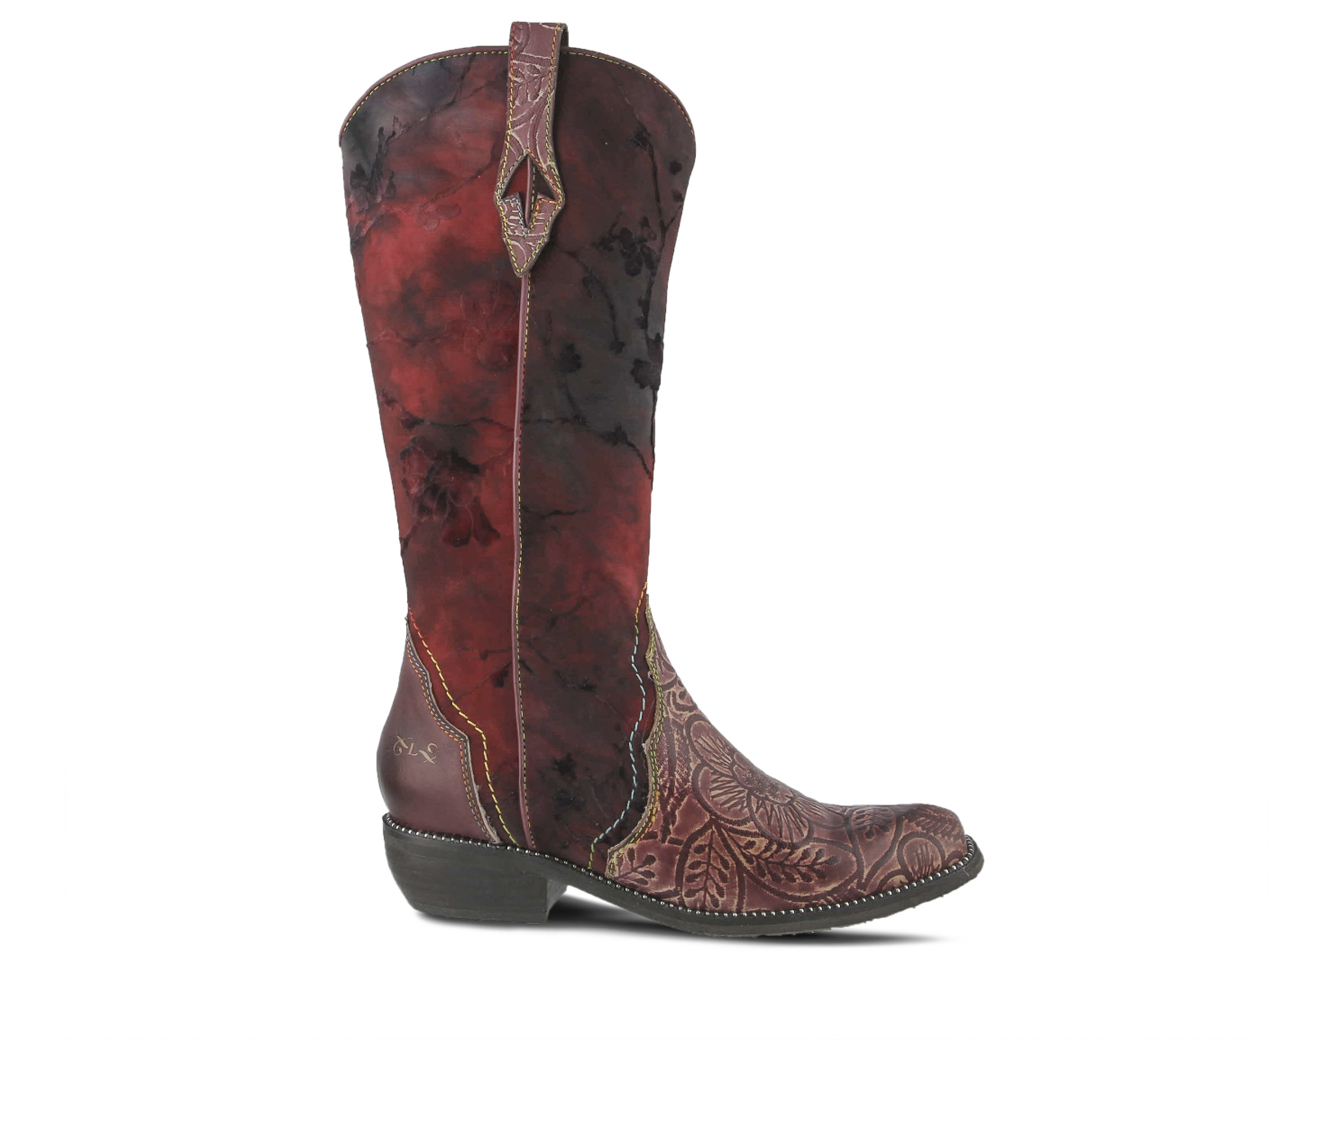 L'Artiste Laretilyn Women's Boots (Red Leather)